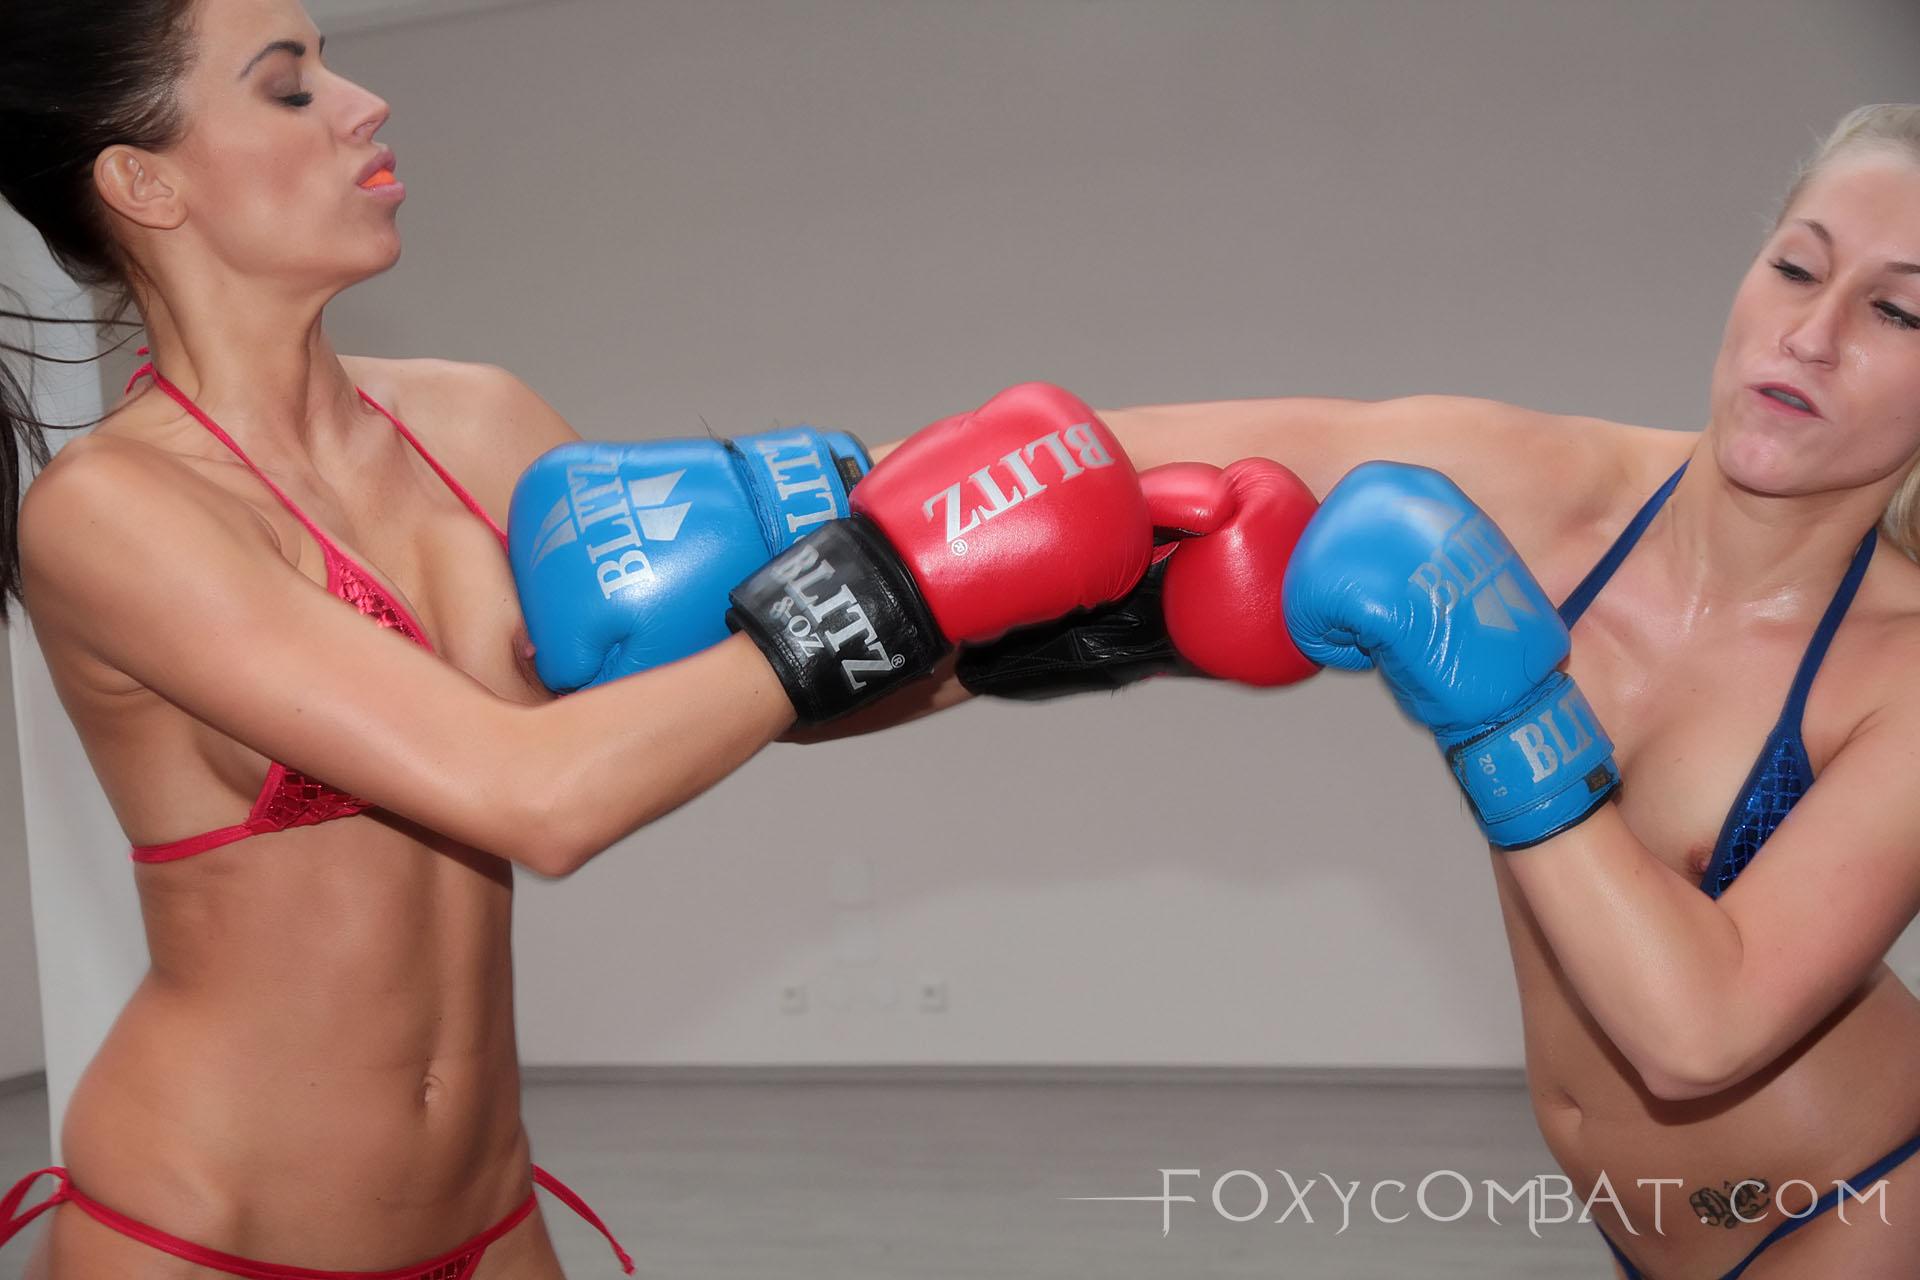 Blonde vs Brunette bikini boxing match